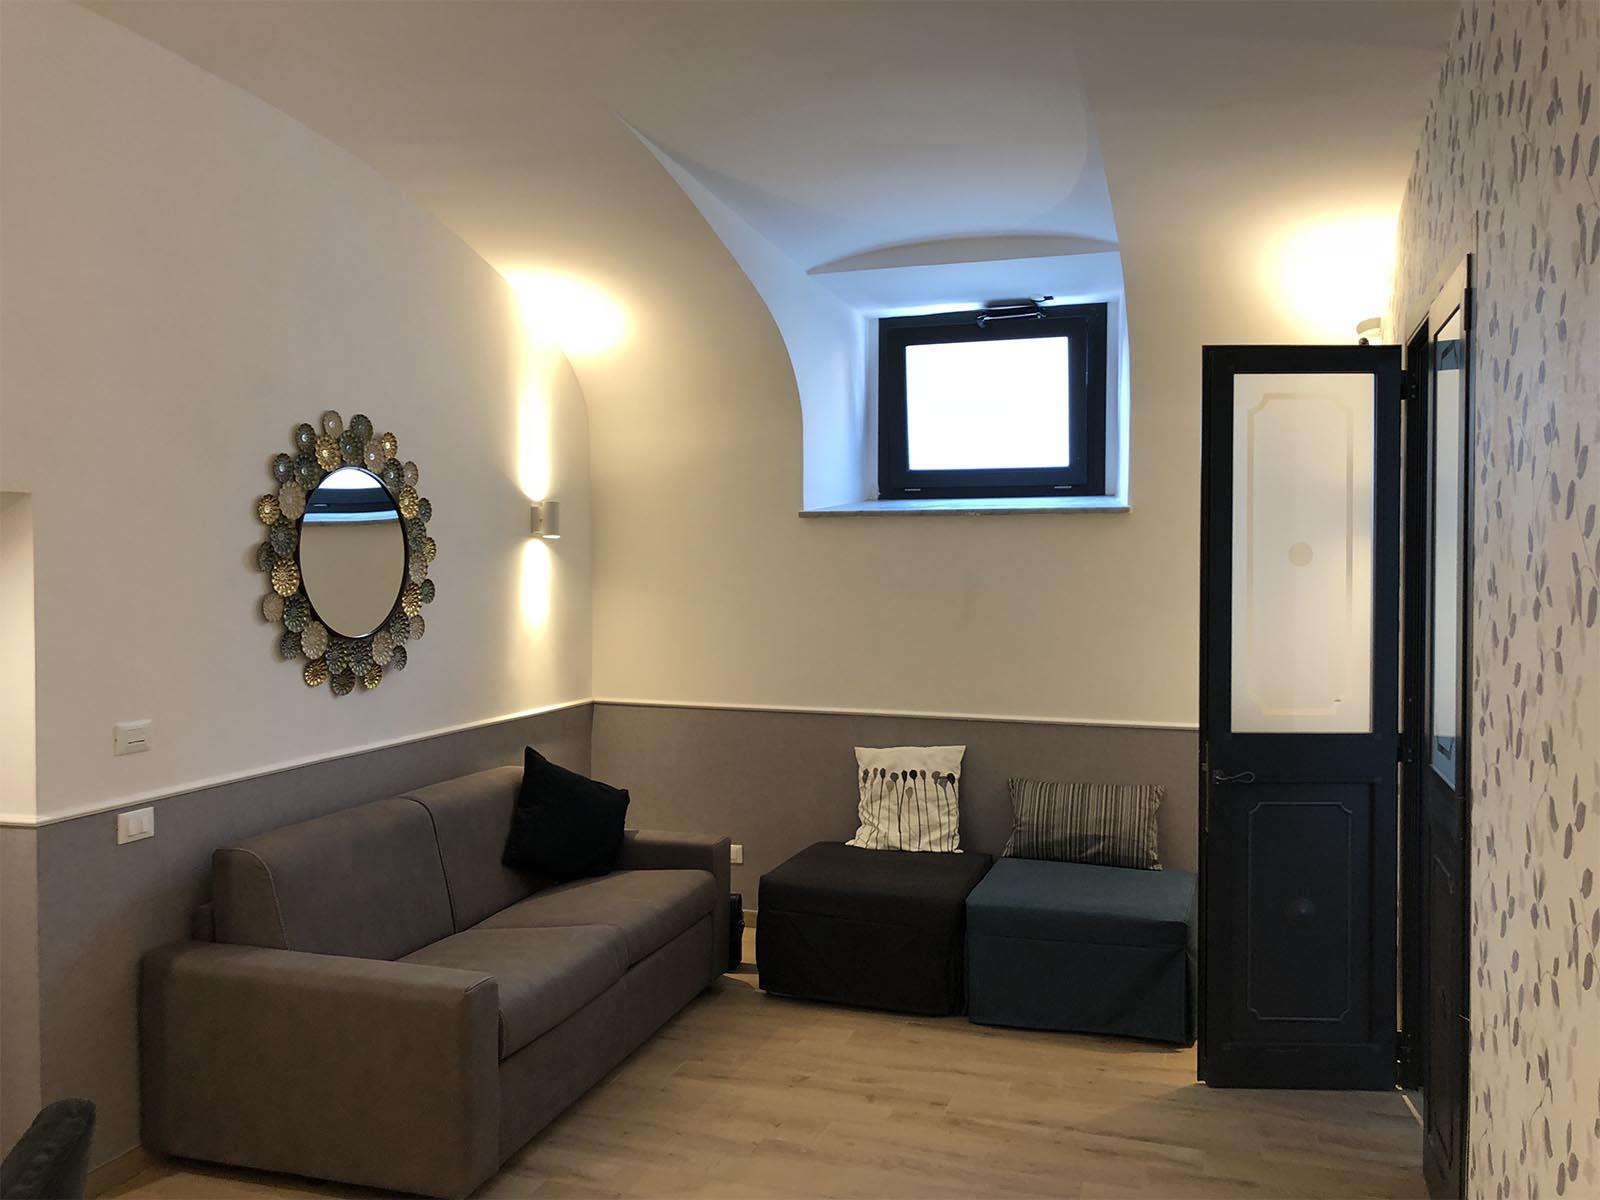 Giolitti Suite Interior 6